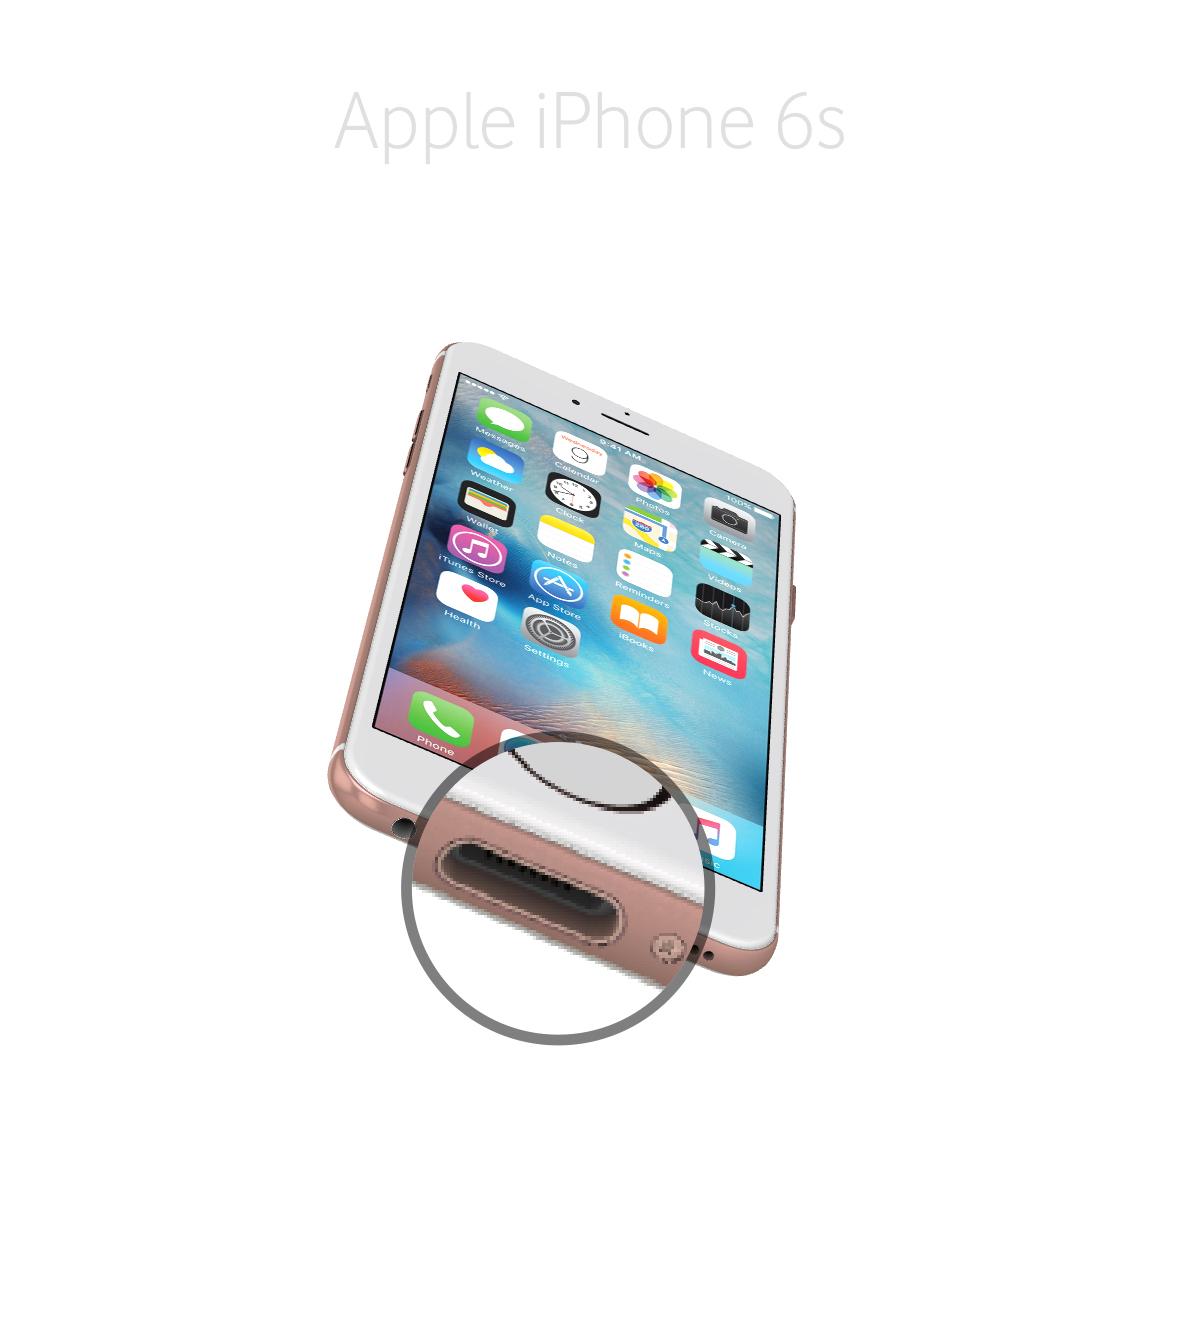 Laga lightningkontakt iPhone 6s